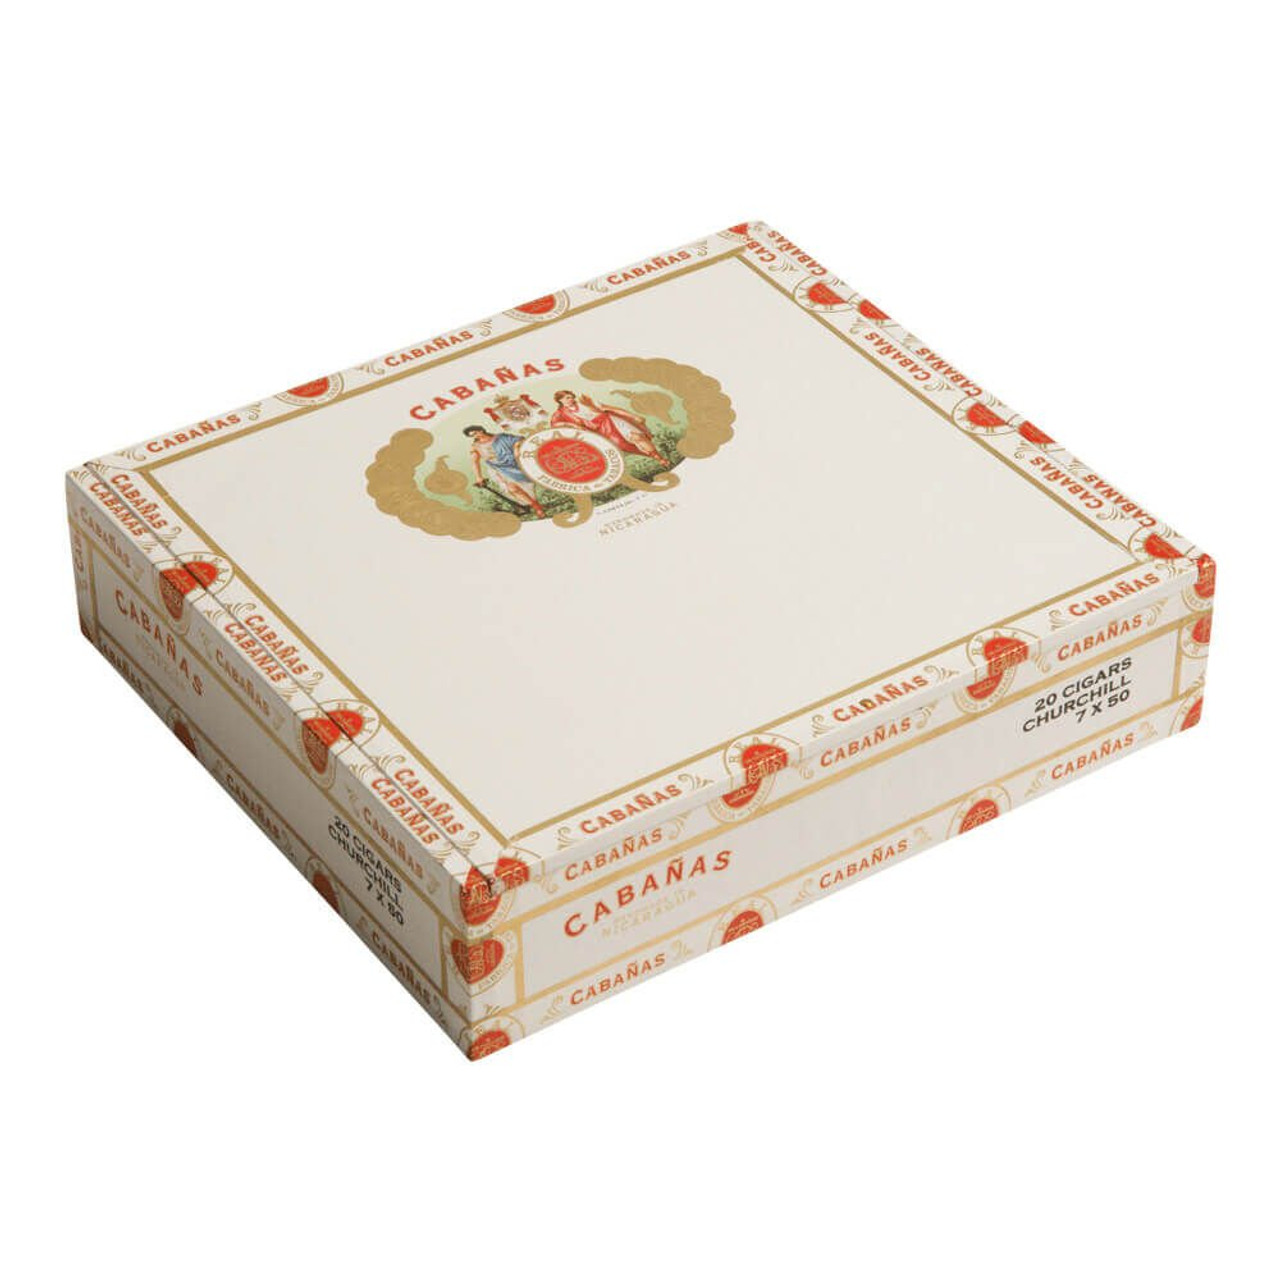 Cabanas Robusto Cigars - 5 x 50 (Box of 20)